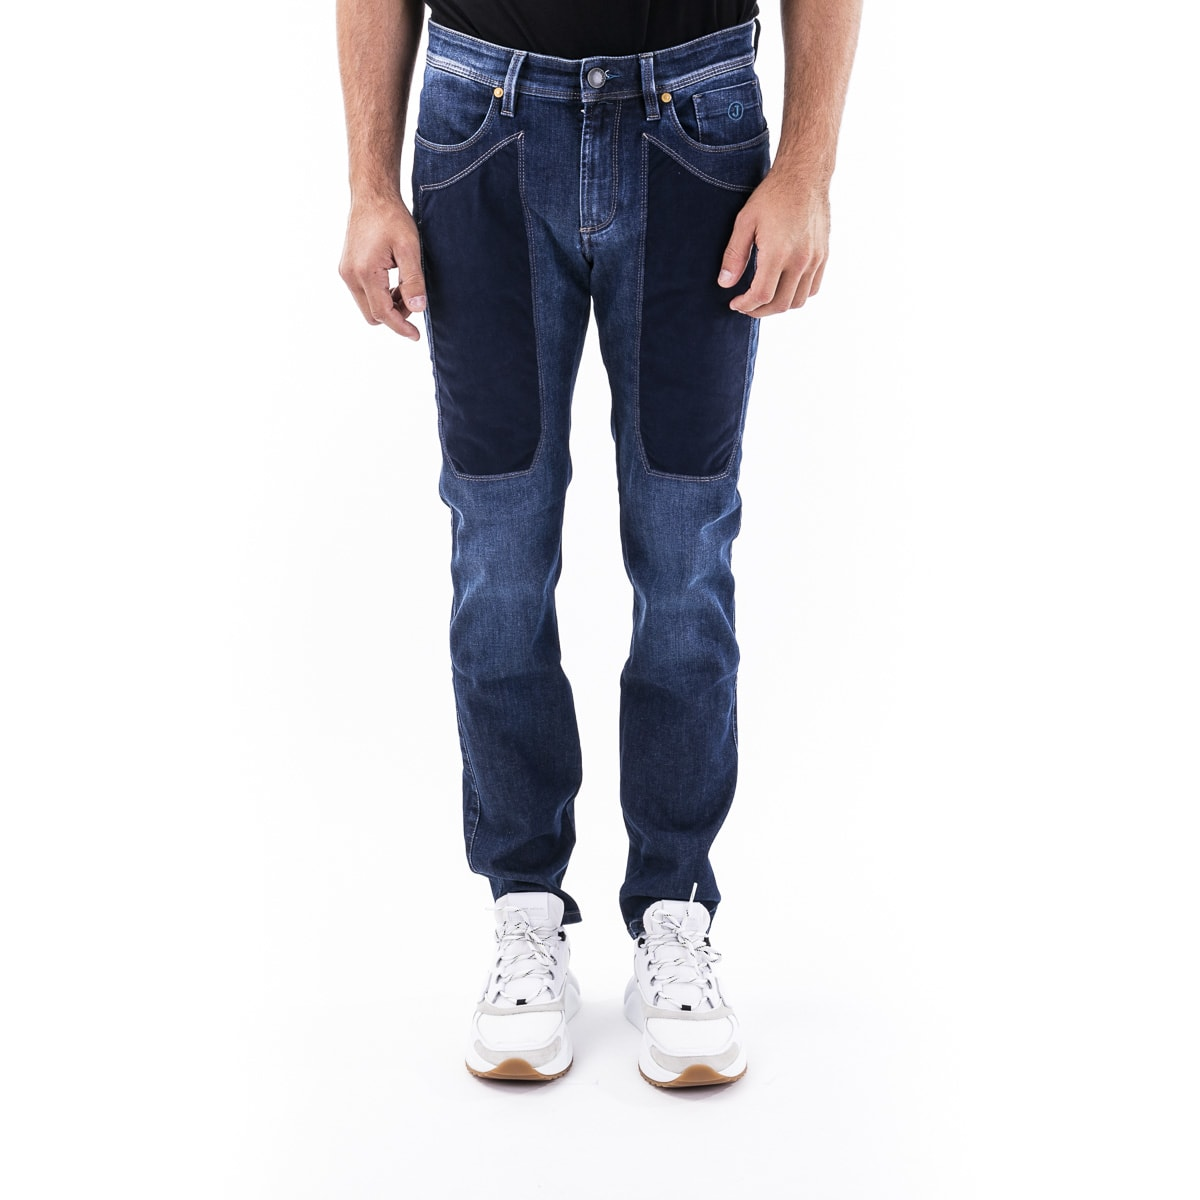 Jeans In Cotton Blend Jeckerson